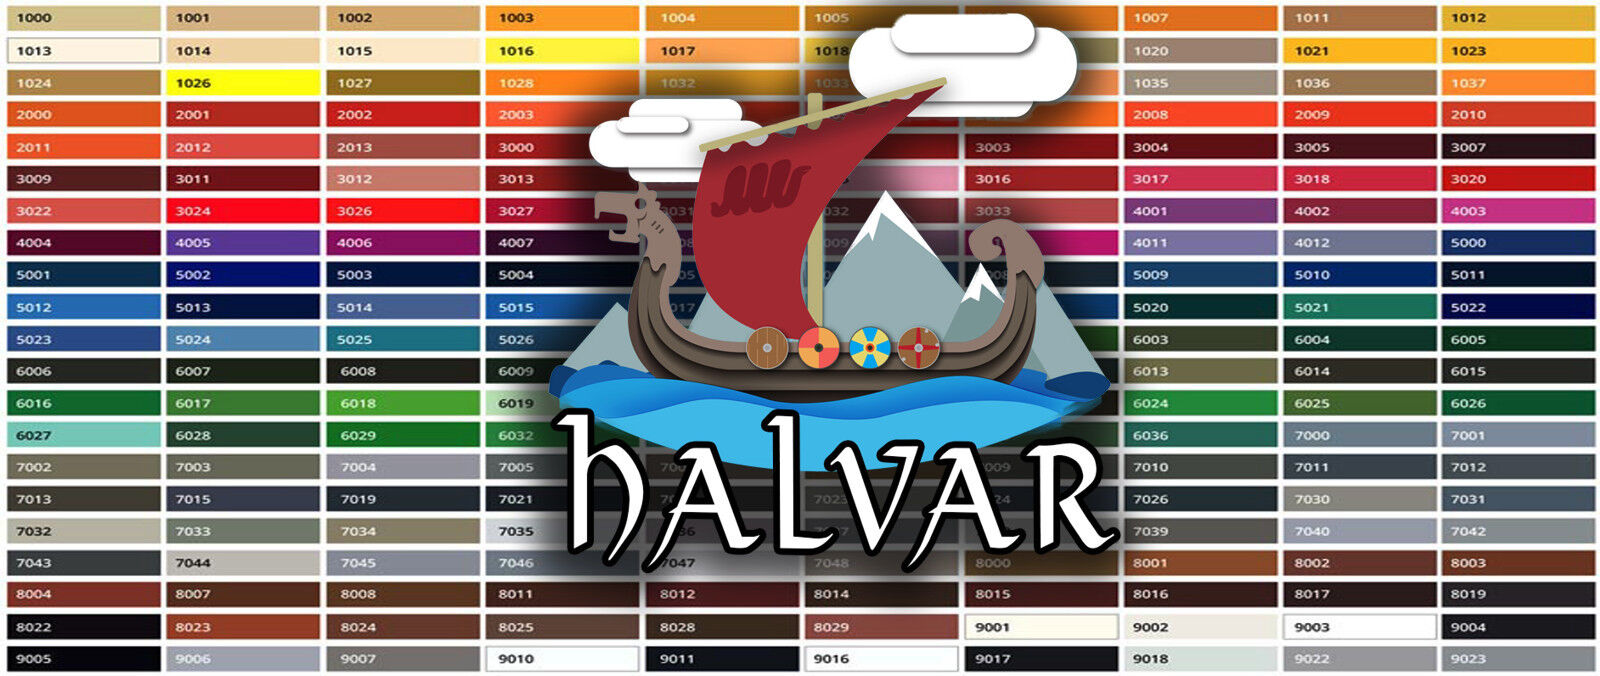 Halvar PU Bootslack Bootsfarbe Yachtlack Metall GFK Holz FARBAUSWAHL Klarlack Anderer RAL-Farbton (Bitte RAL Wert senden)